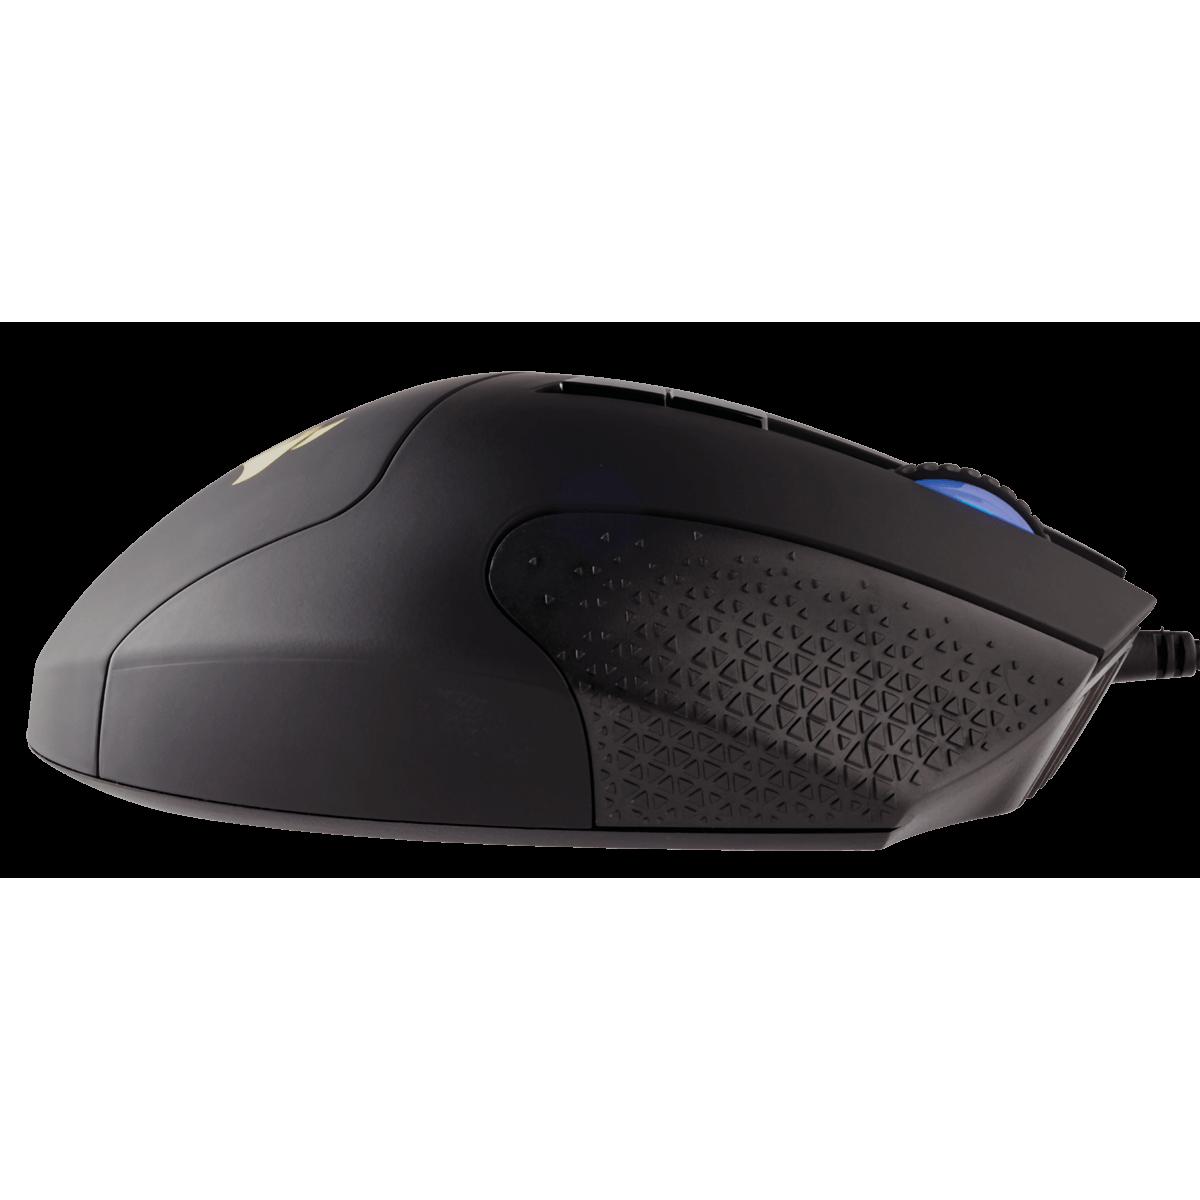 Mouse Gamer Corsair Scimitar RGB ELITE, 18.000 DPI, 17 Botões Programáveis, Black, CH-9304211-NA